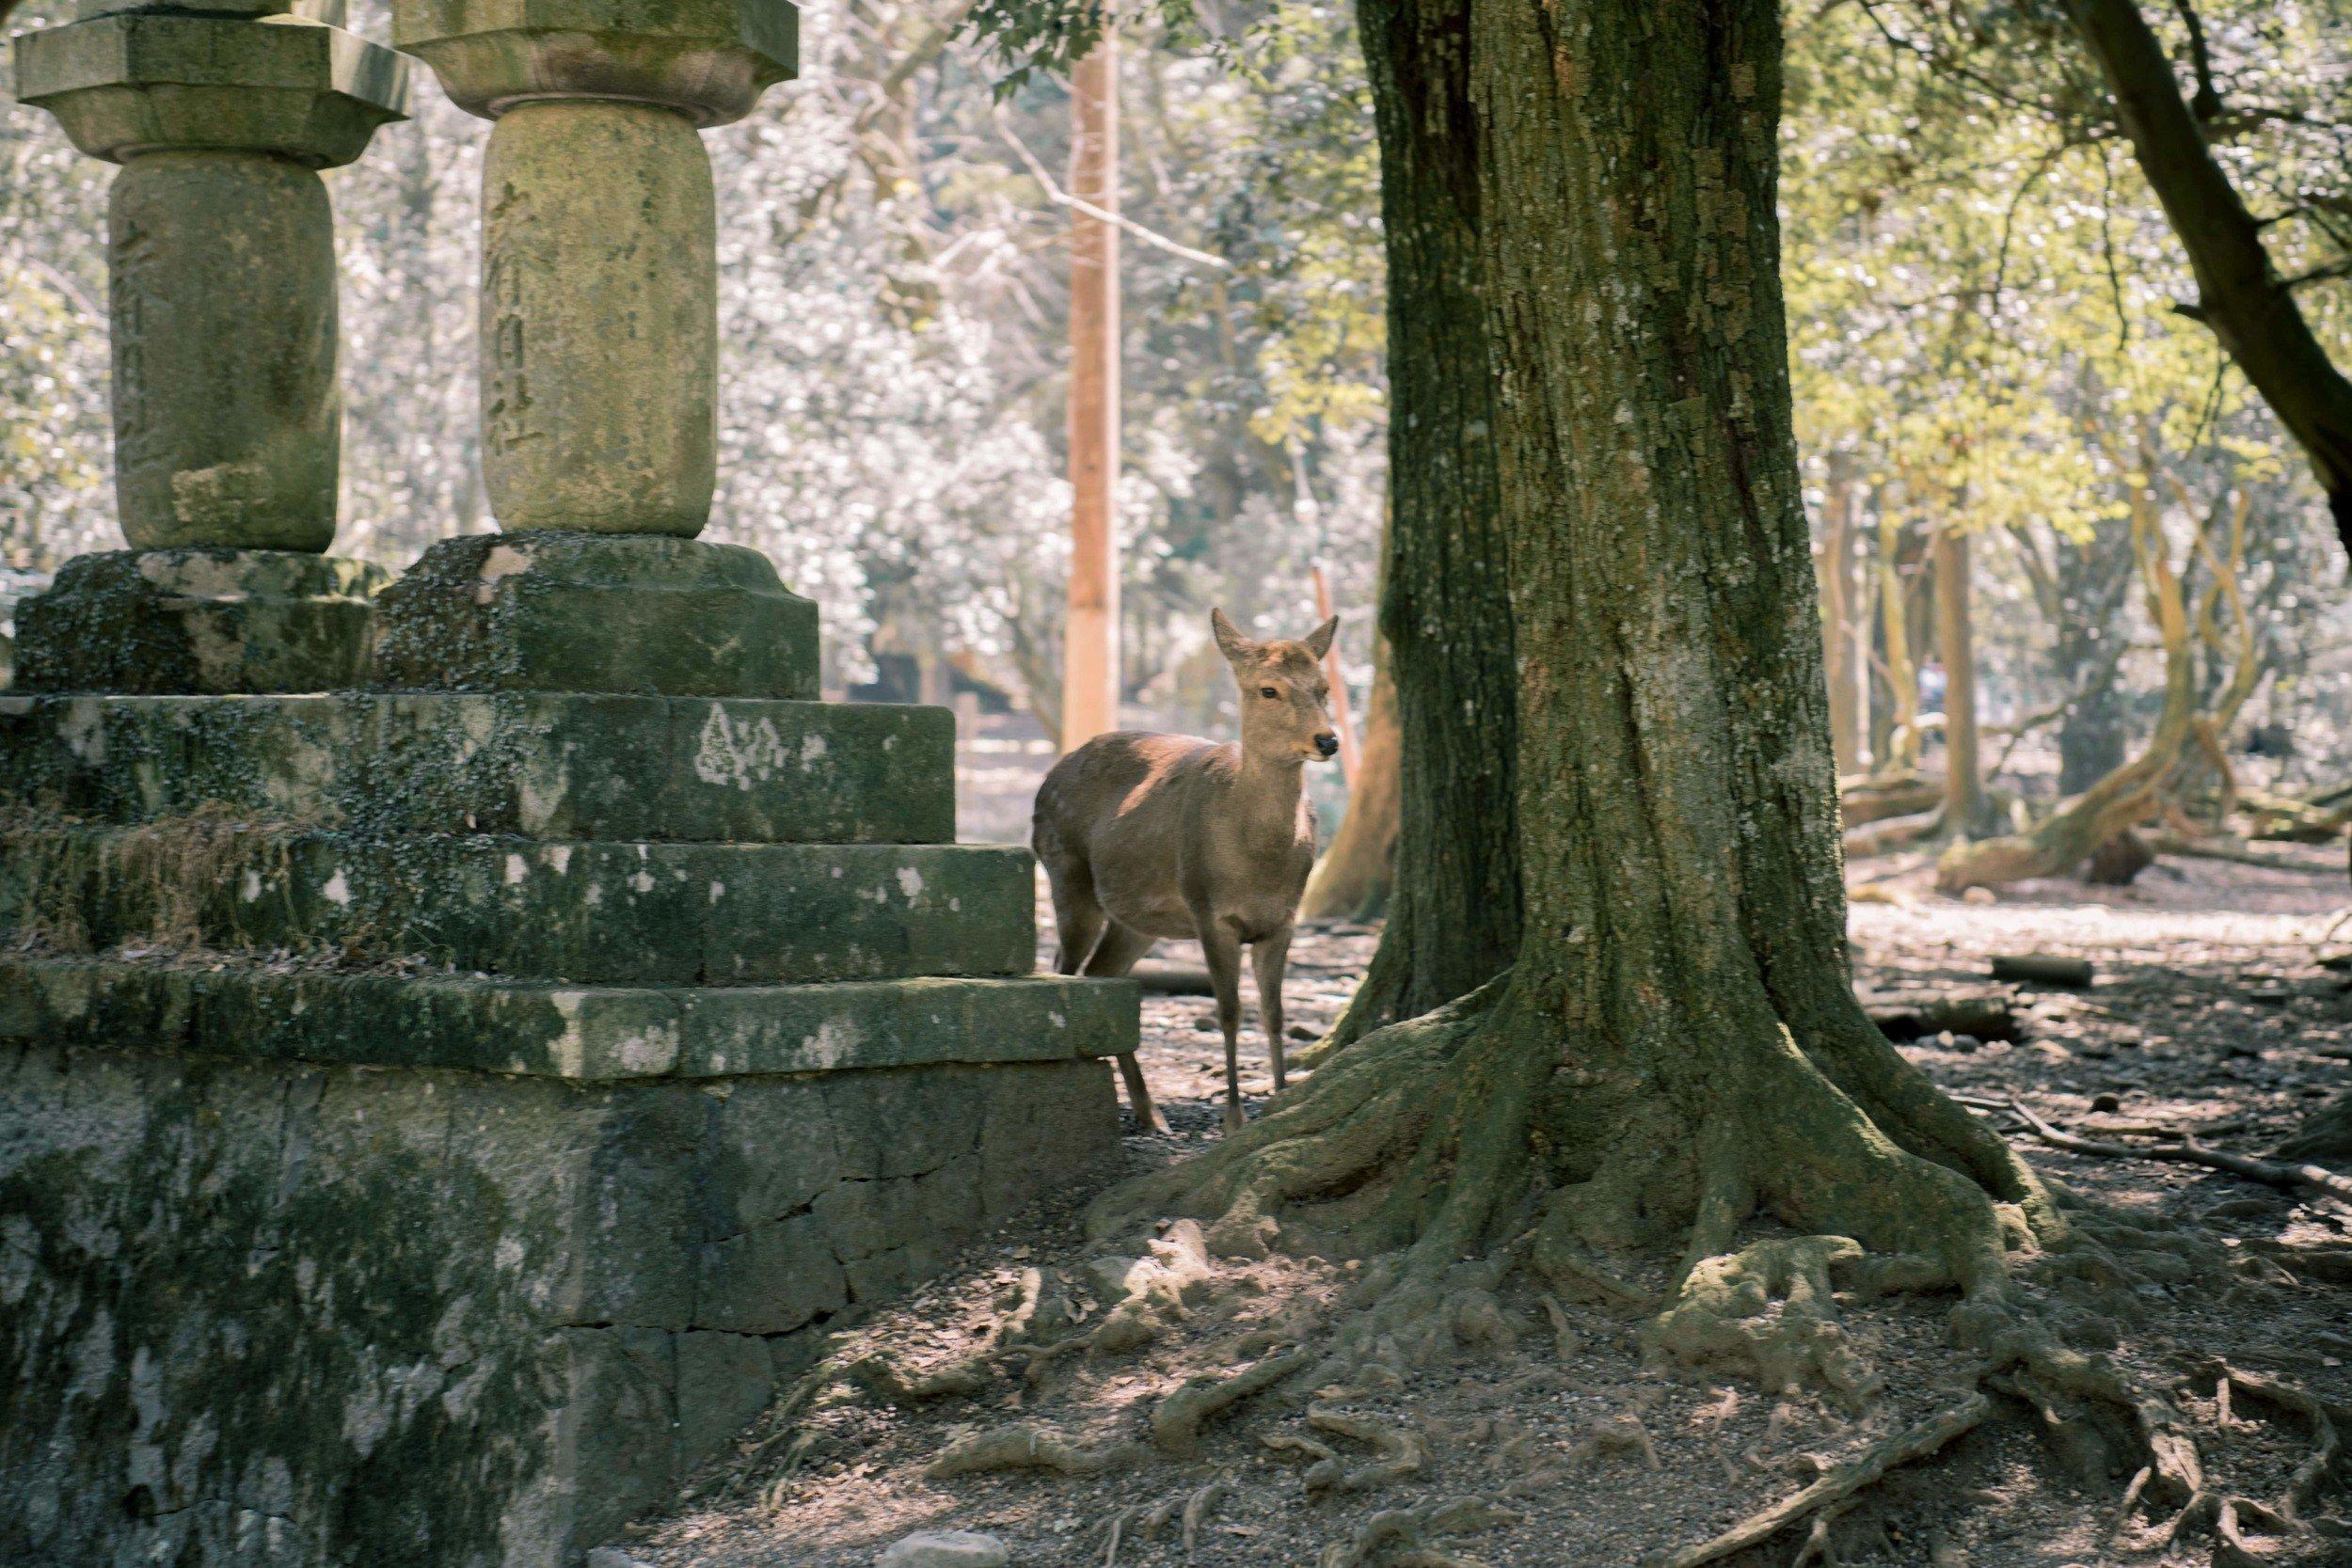 Nara Deer tour from Kyoto